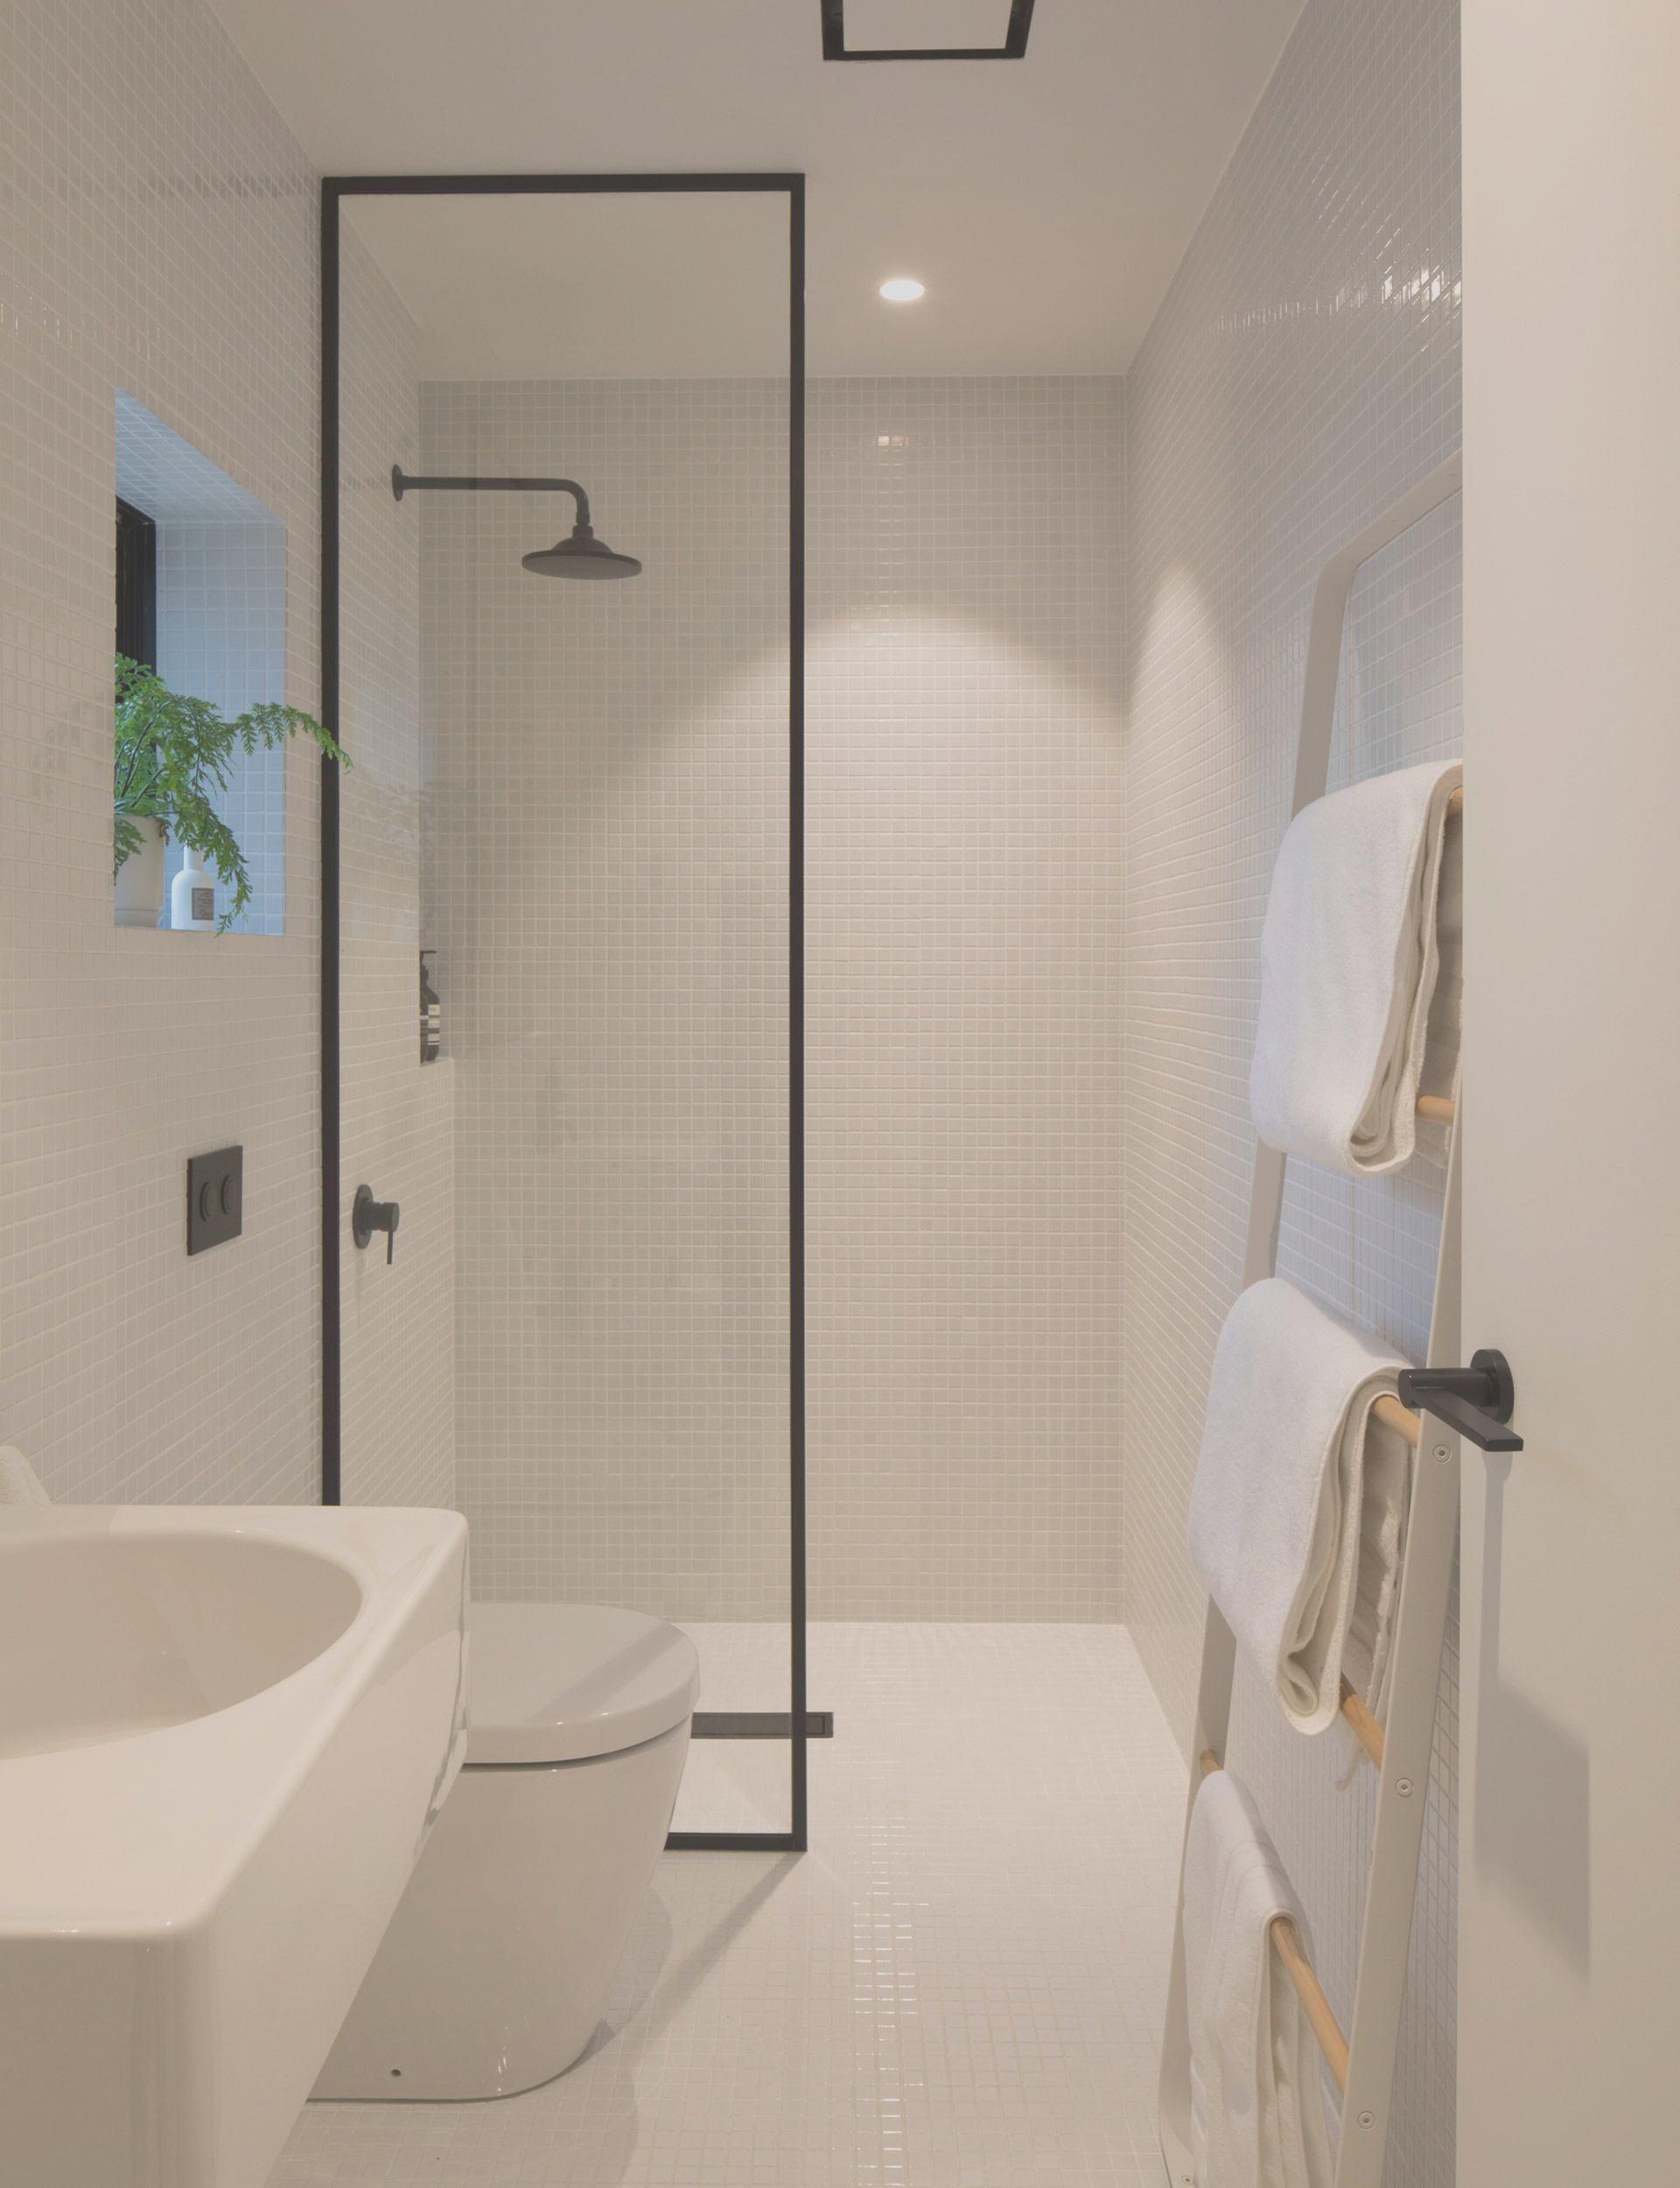 11 Bathroom Ideas for Minimalist Houses in 11  Small bathroom